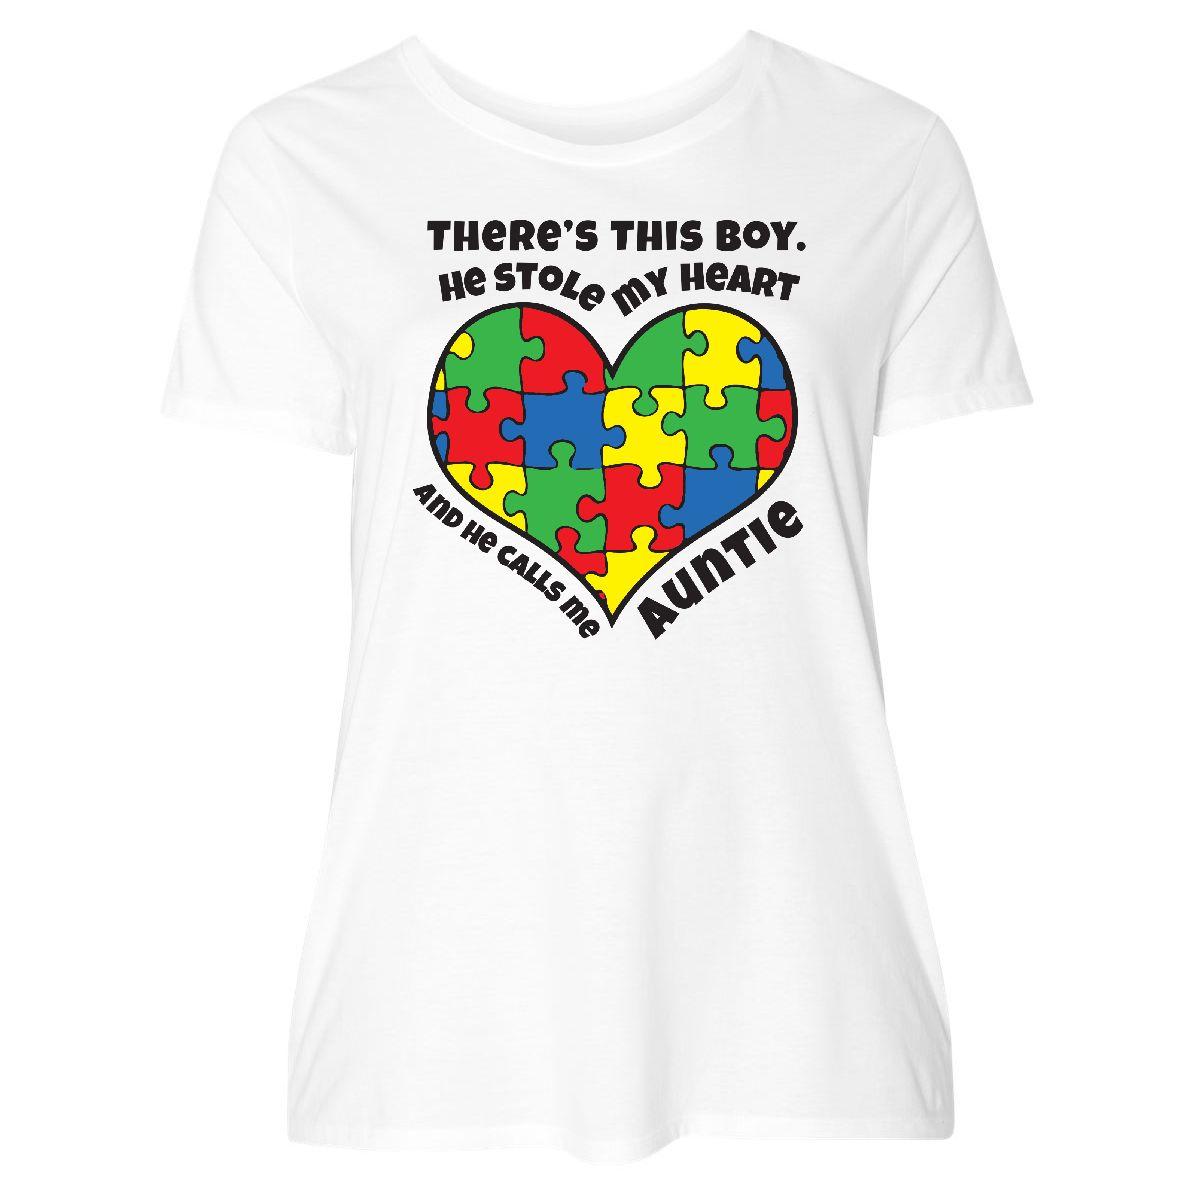 bd562f12fd4 Details about Inktastic Auntie Of Autistic Nephew Women s Plus Size T-Shirt  Autism Ribbon Just